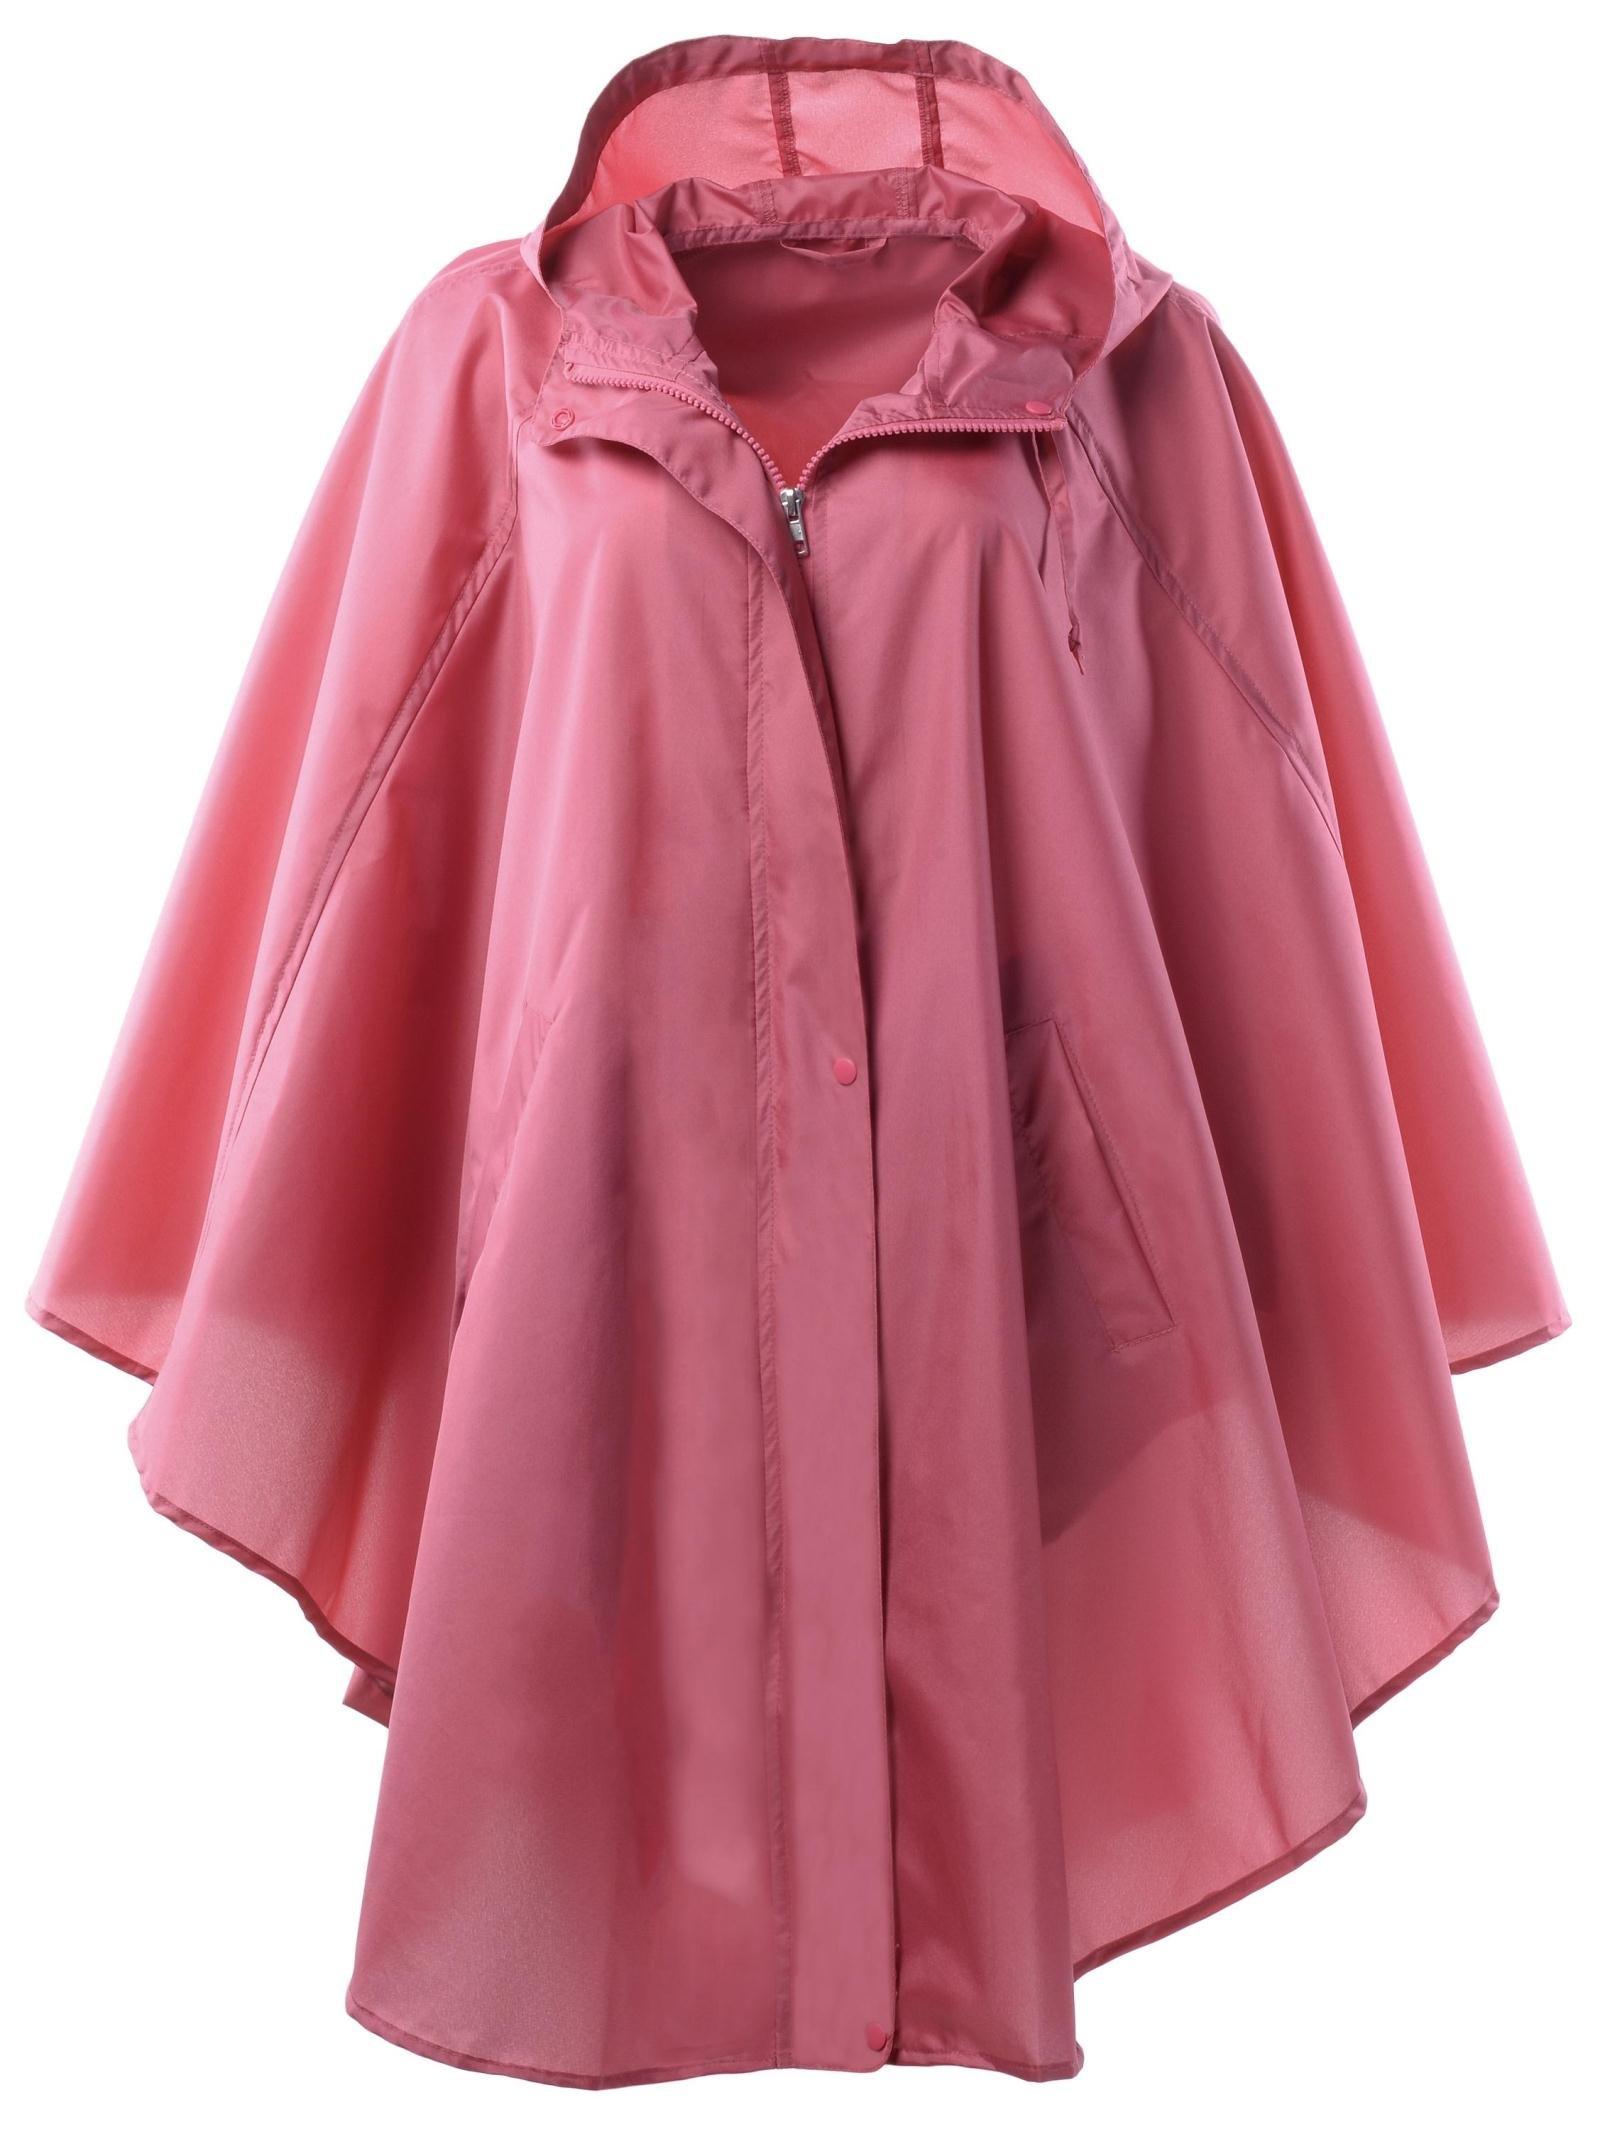 QZUnique Women's Waterproof Packable Rain Jacket Batwing-sleeved Poncho Raincoat,Red,Onesize